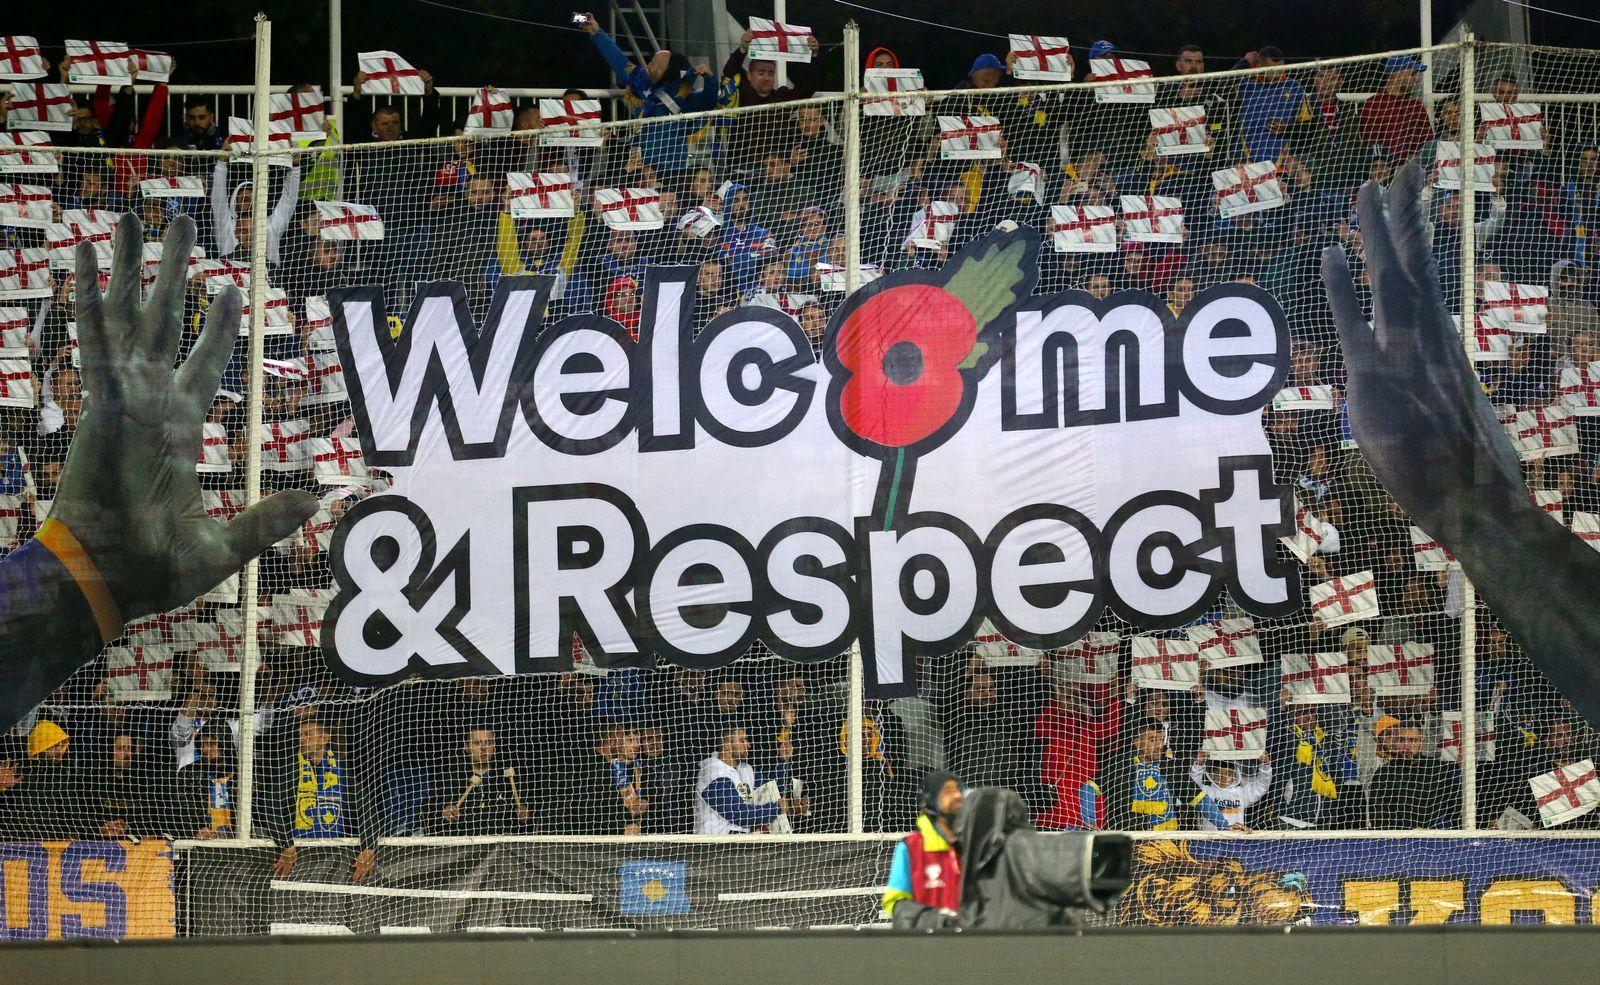 Kosovo v England - UEFA Euro 2020 Qualifying - Group A - Fadil Vo